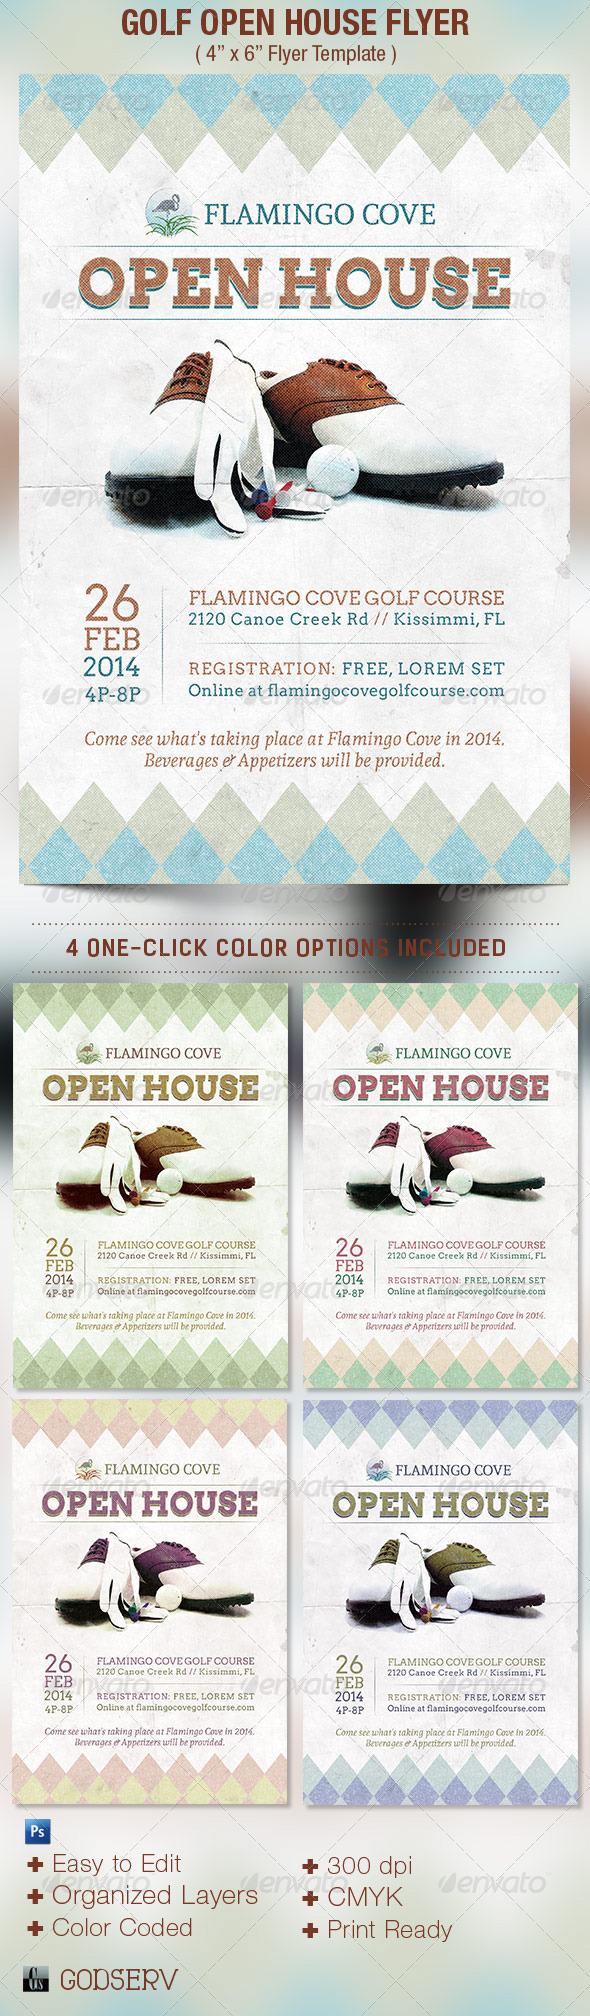 golf open house flyer template on behance. Black Bedroom Furniture Sets. Home Design Ideas